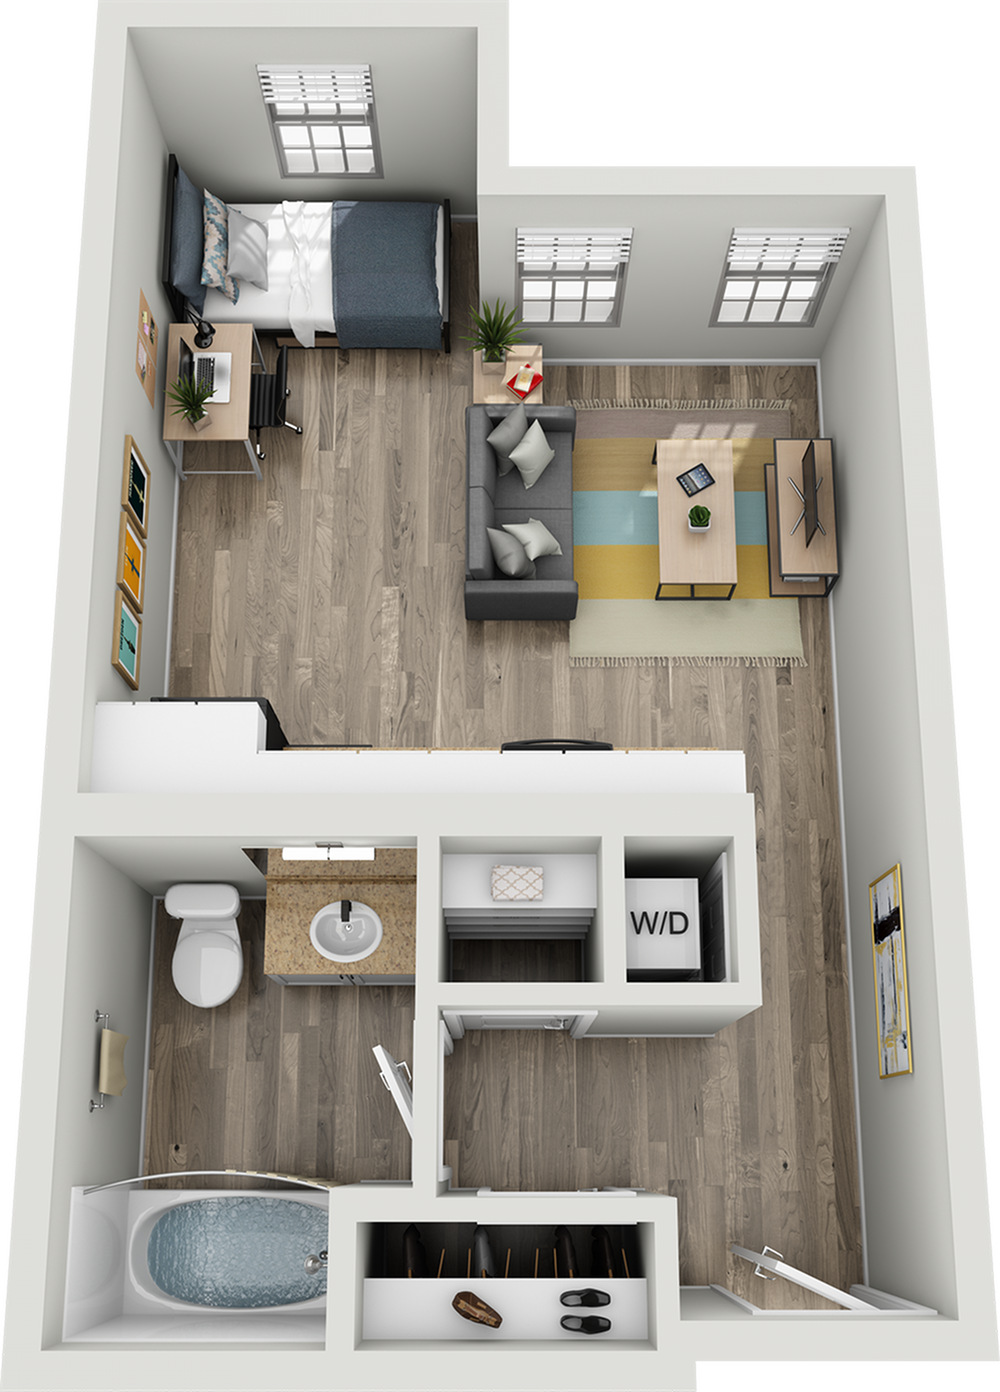 A1B | Studio1 bath | from 425 square feet